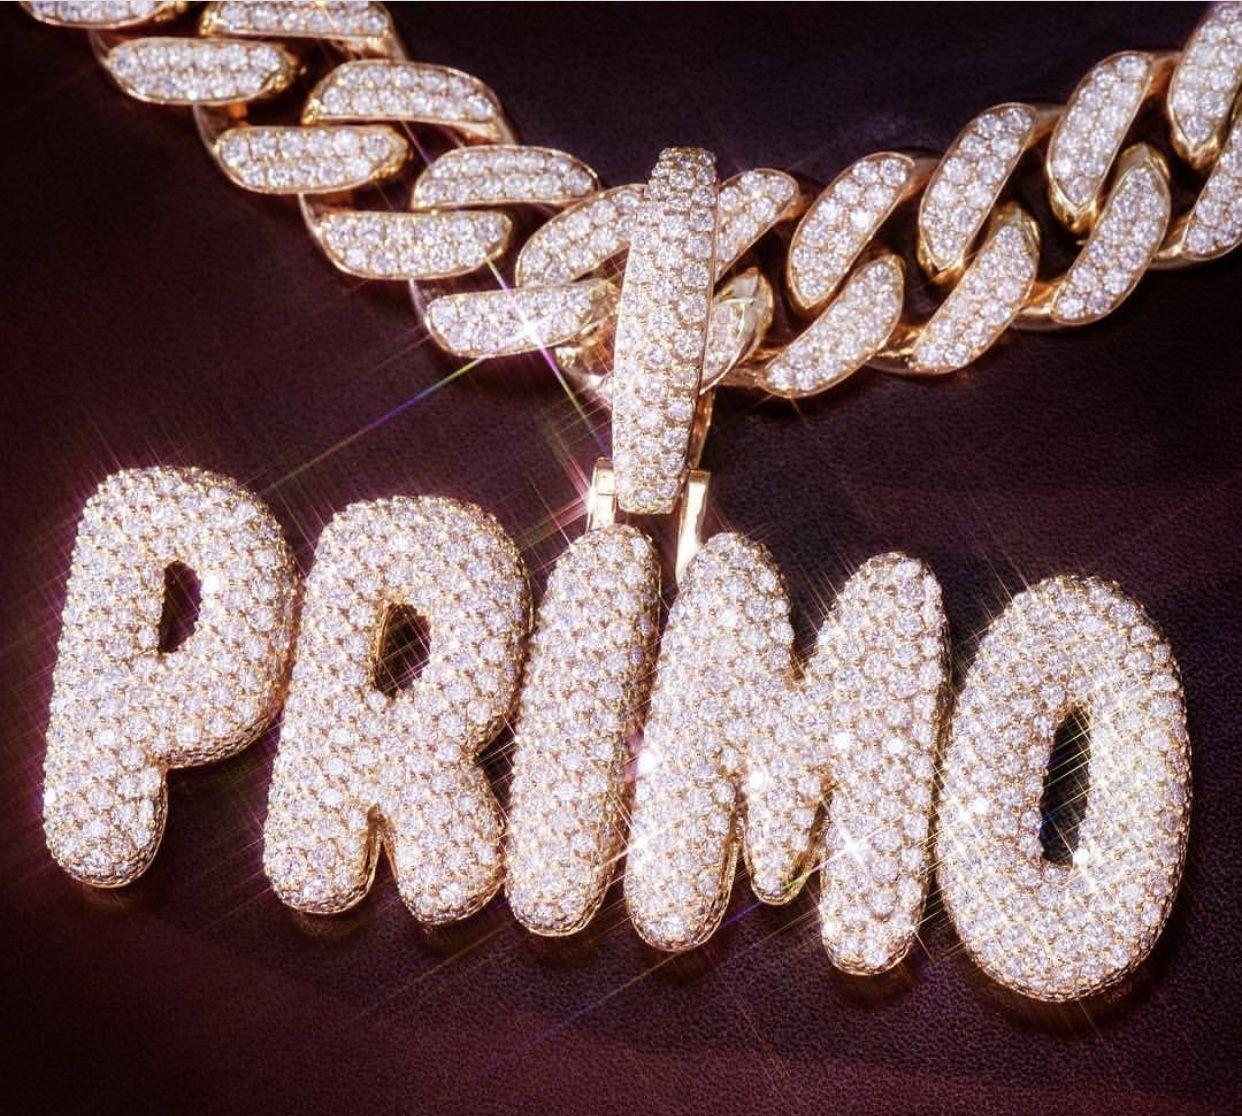 Pin by GreenLeaf Merchandise on CHAINZ N THE HIPPOPOTAMUS